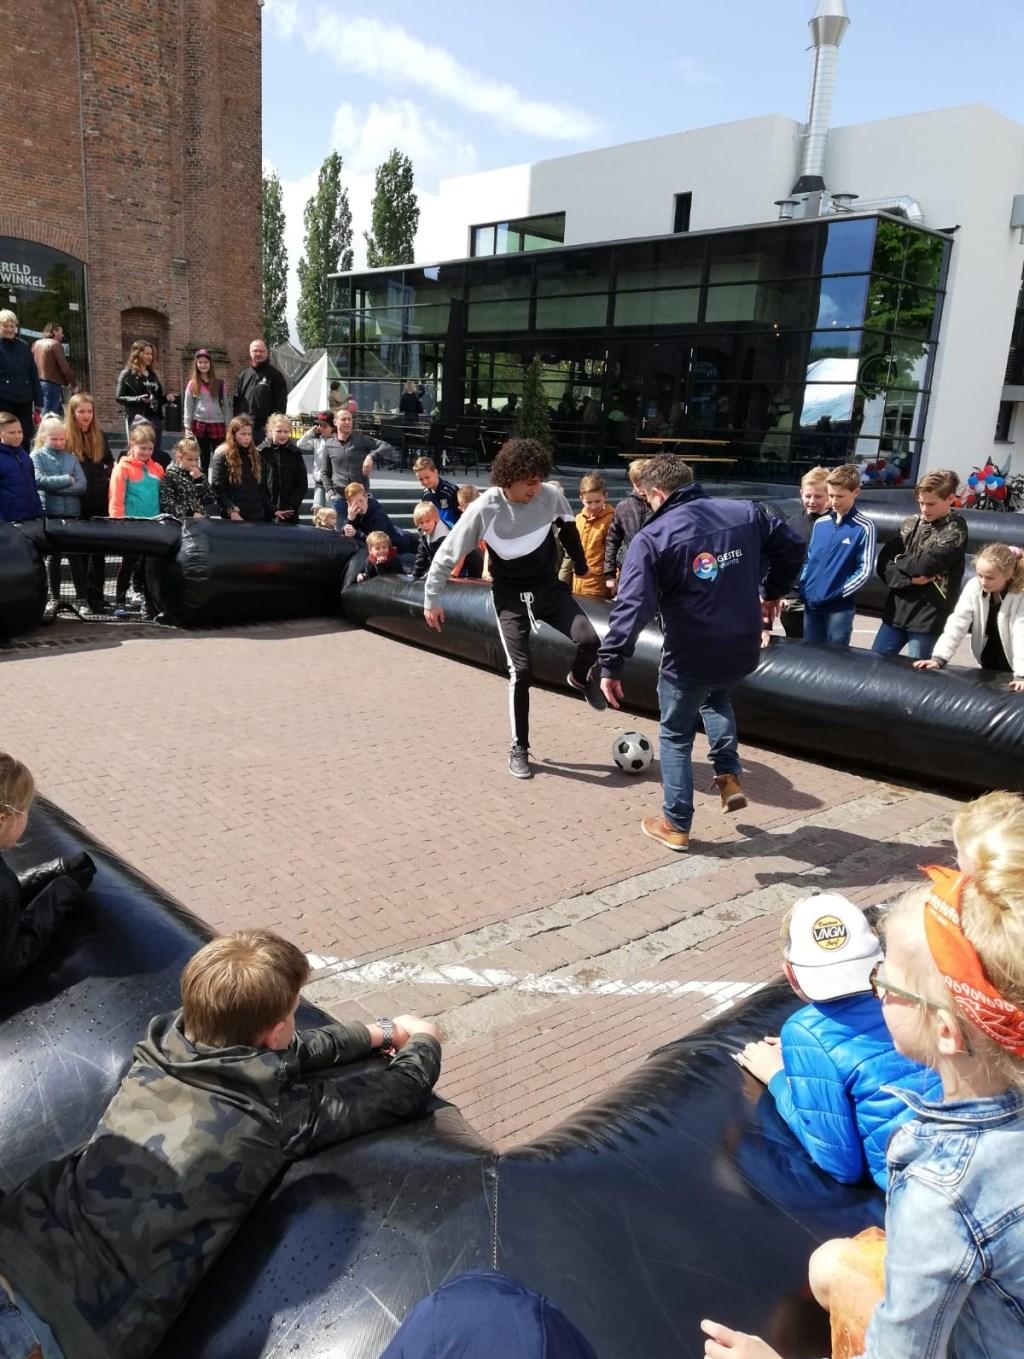 Pannaspeler dolt kinderen Foto: Gestel Events © MooiGestel